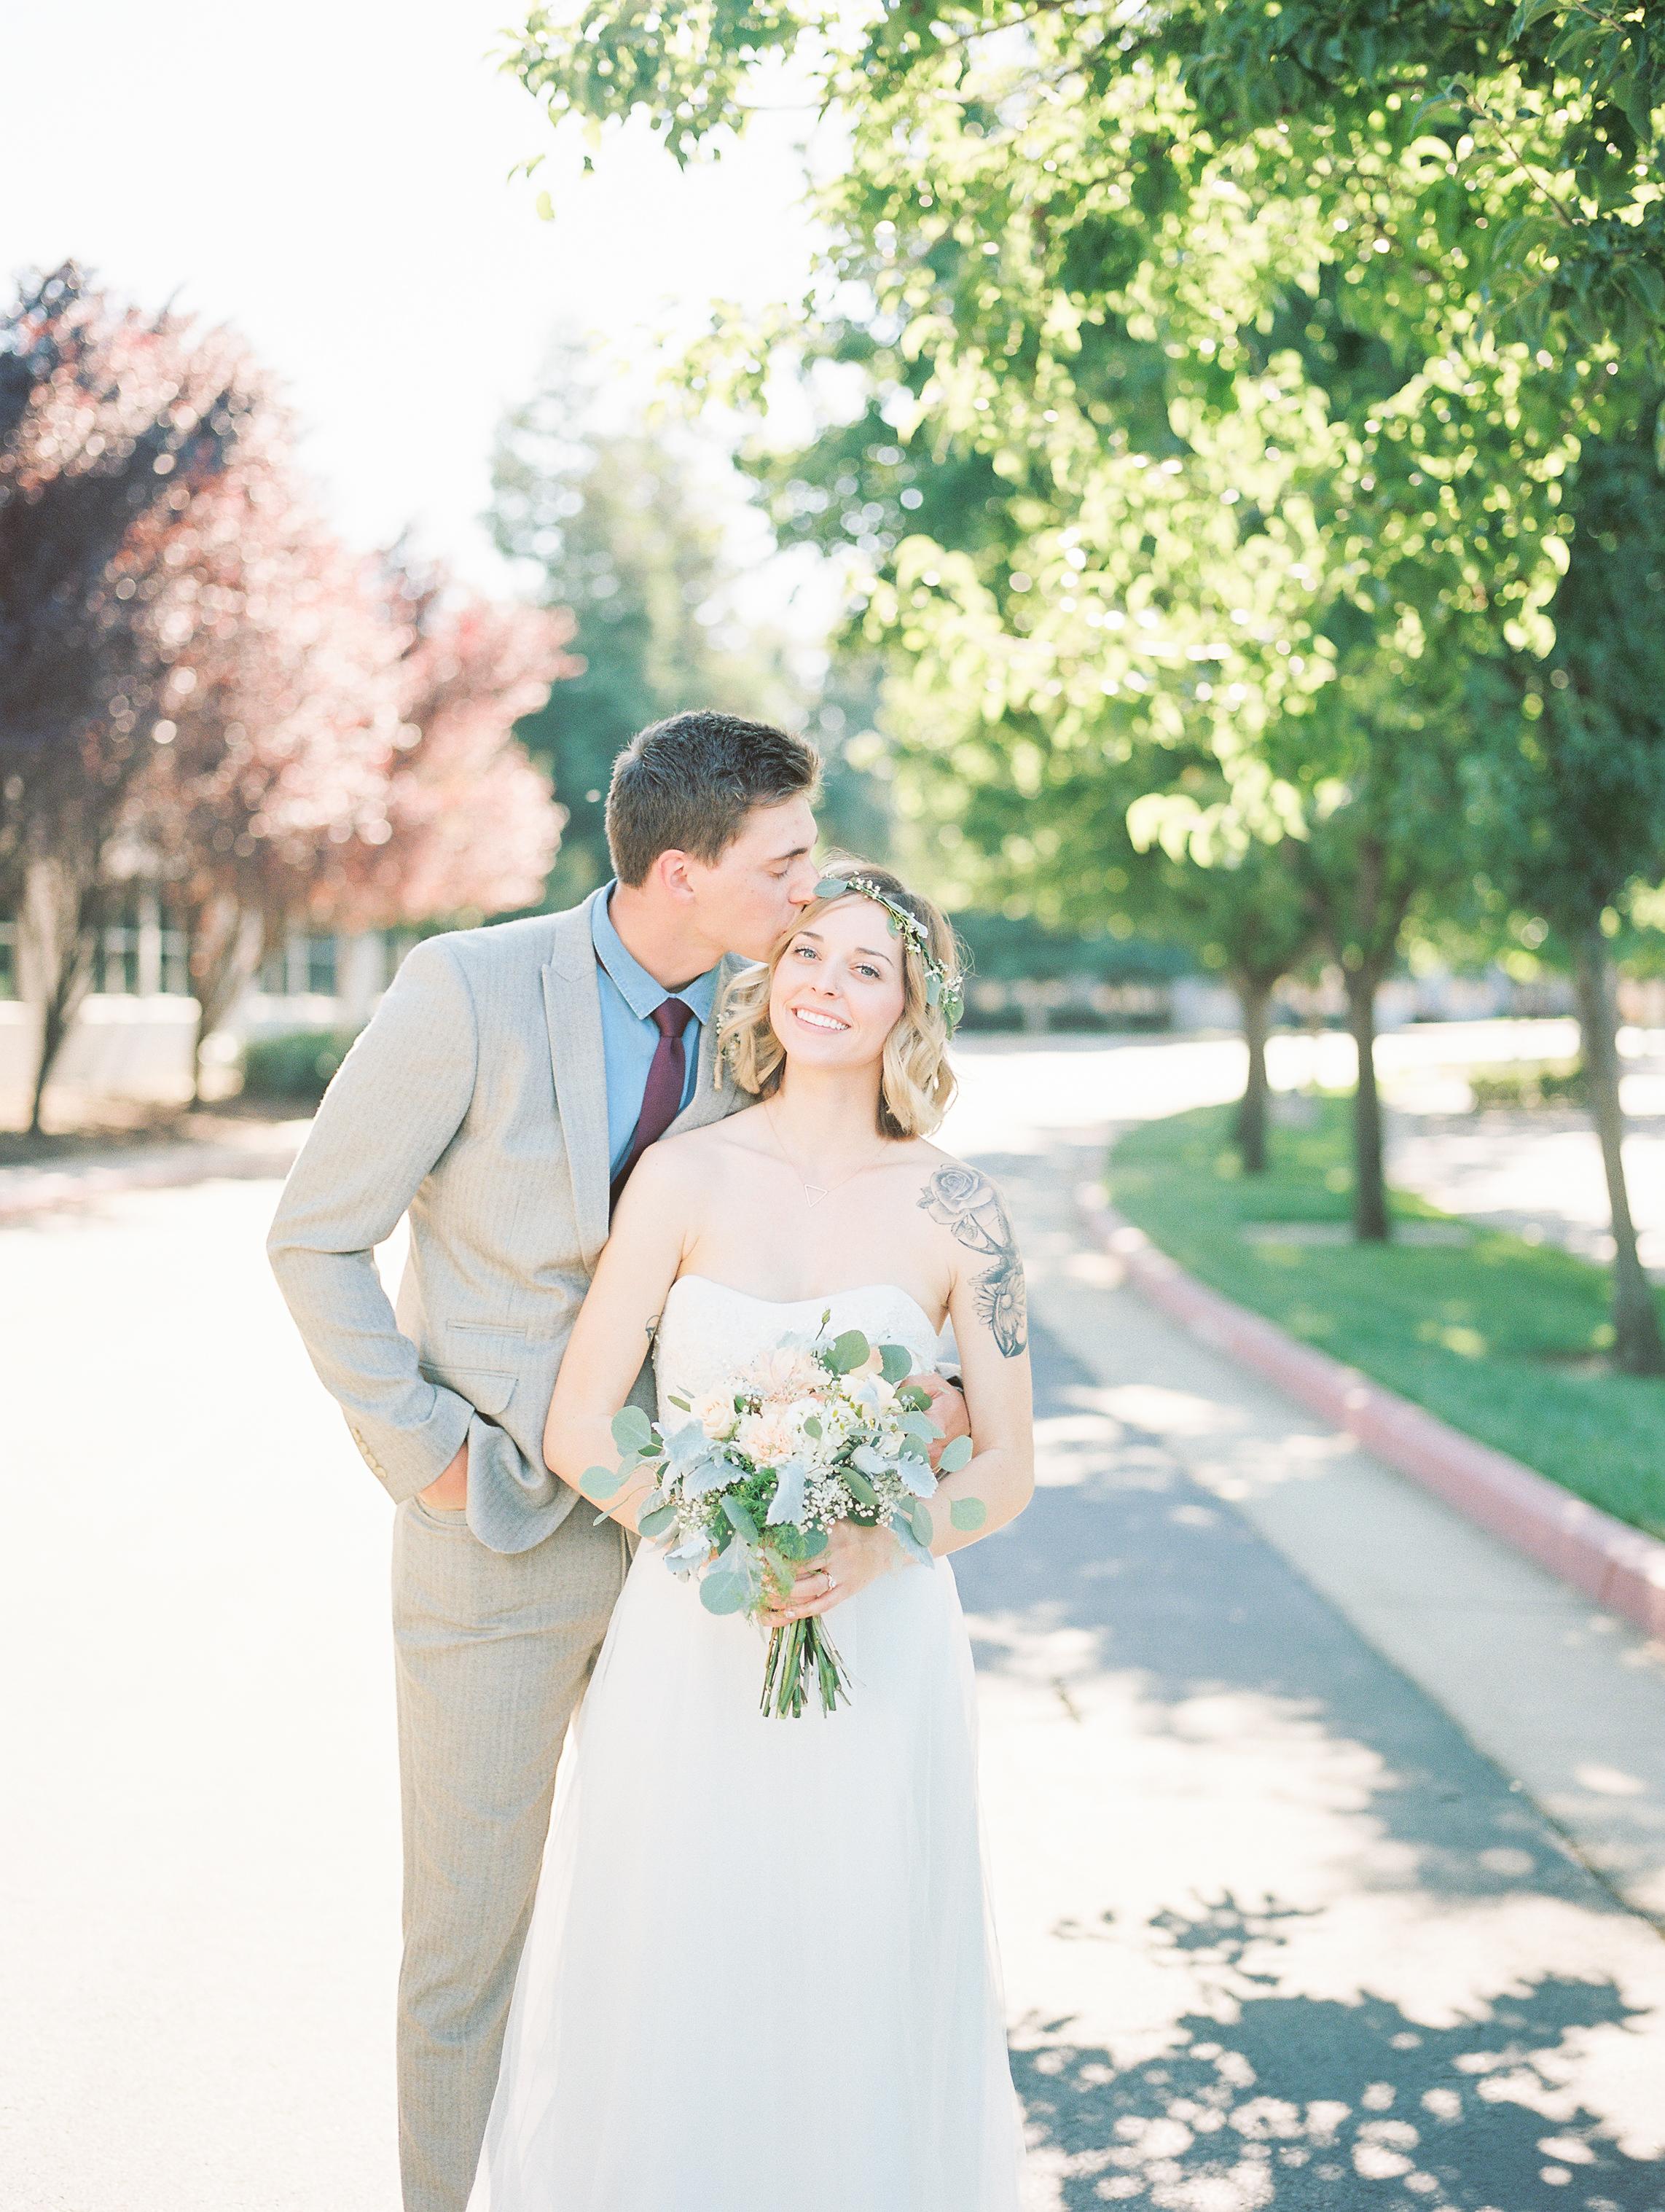 clayton+kennedy-married-filmscans-5.jpg